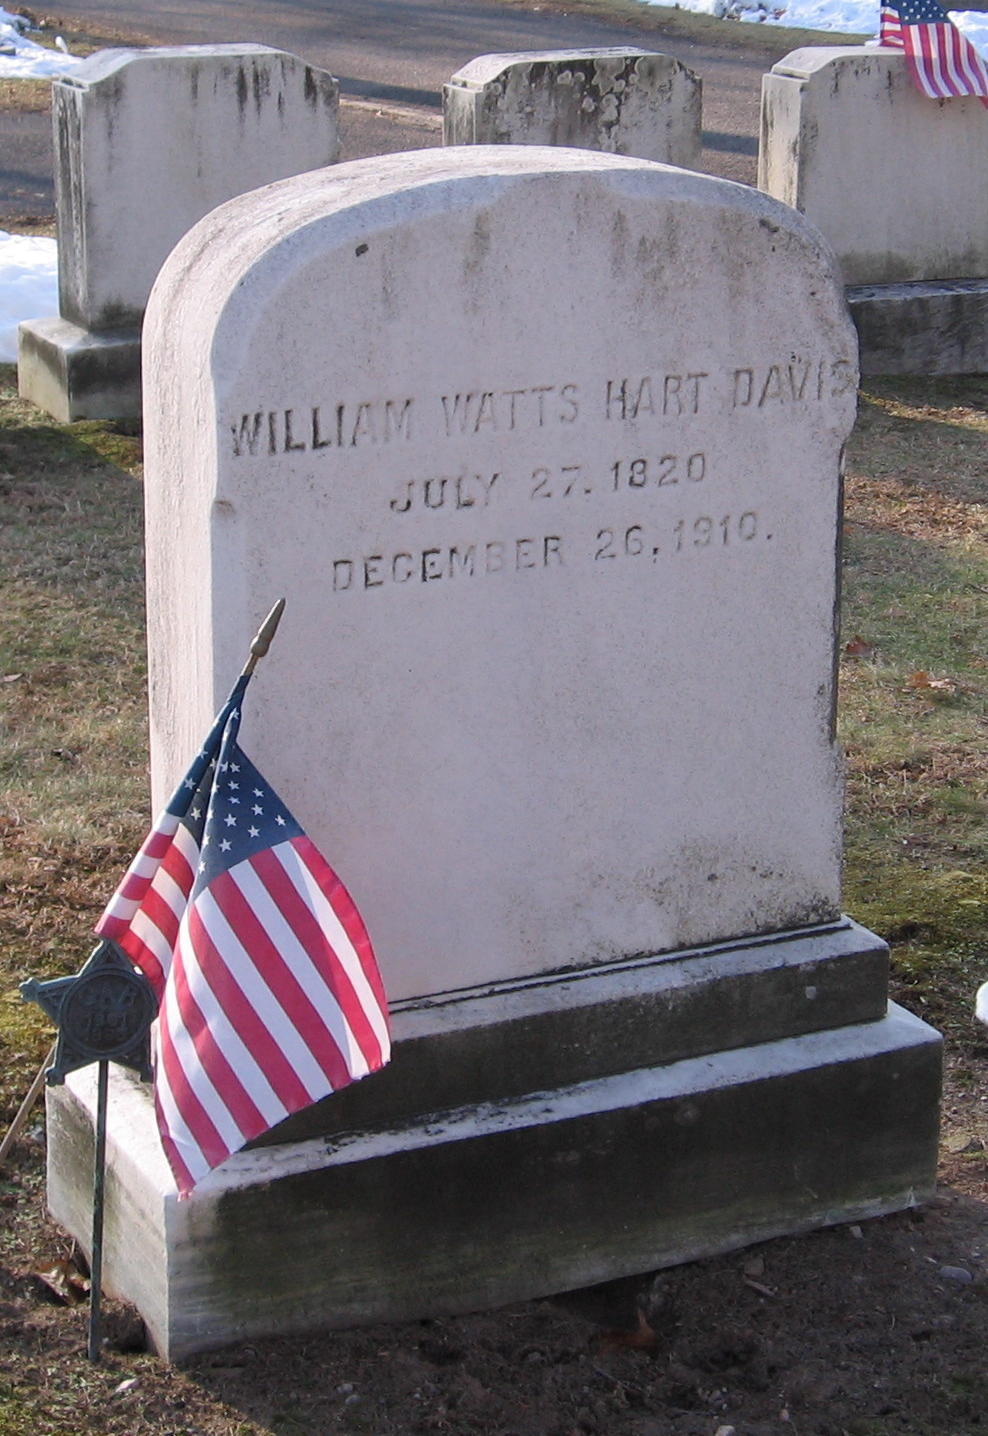 William Watts Hart Davis